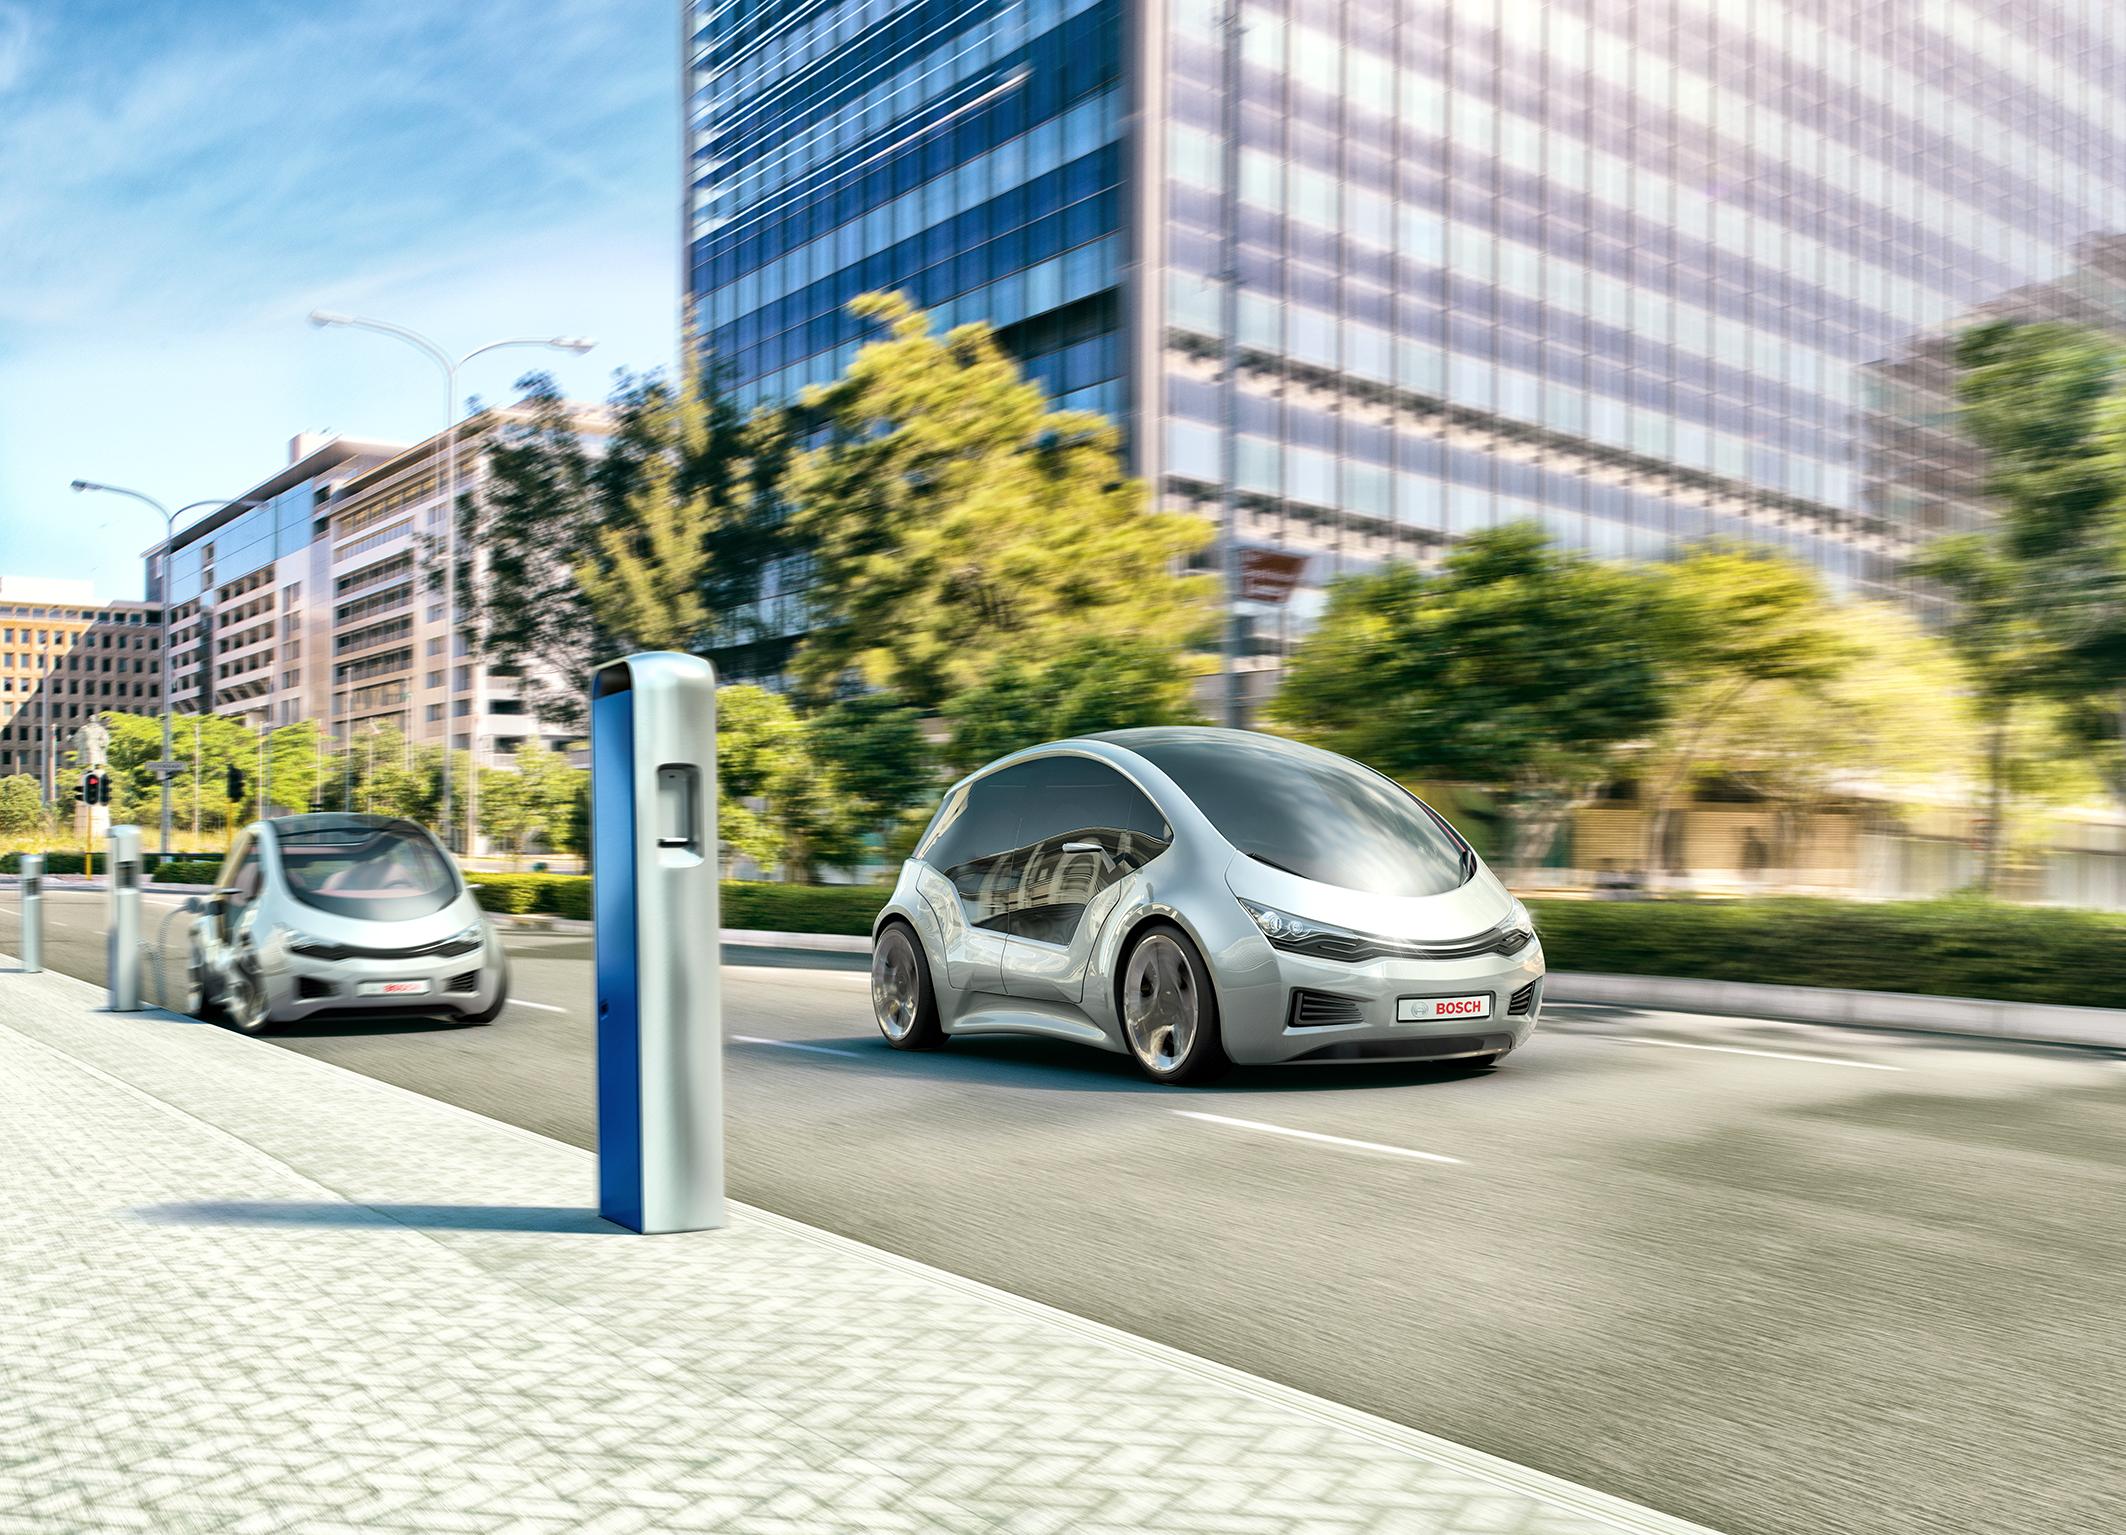 Electromobility has enormous potential